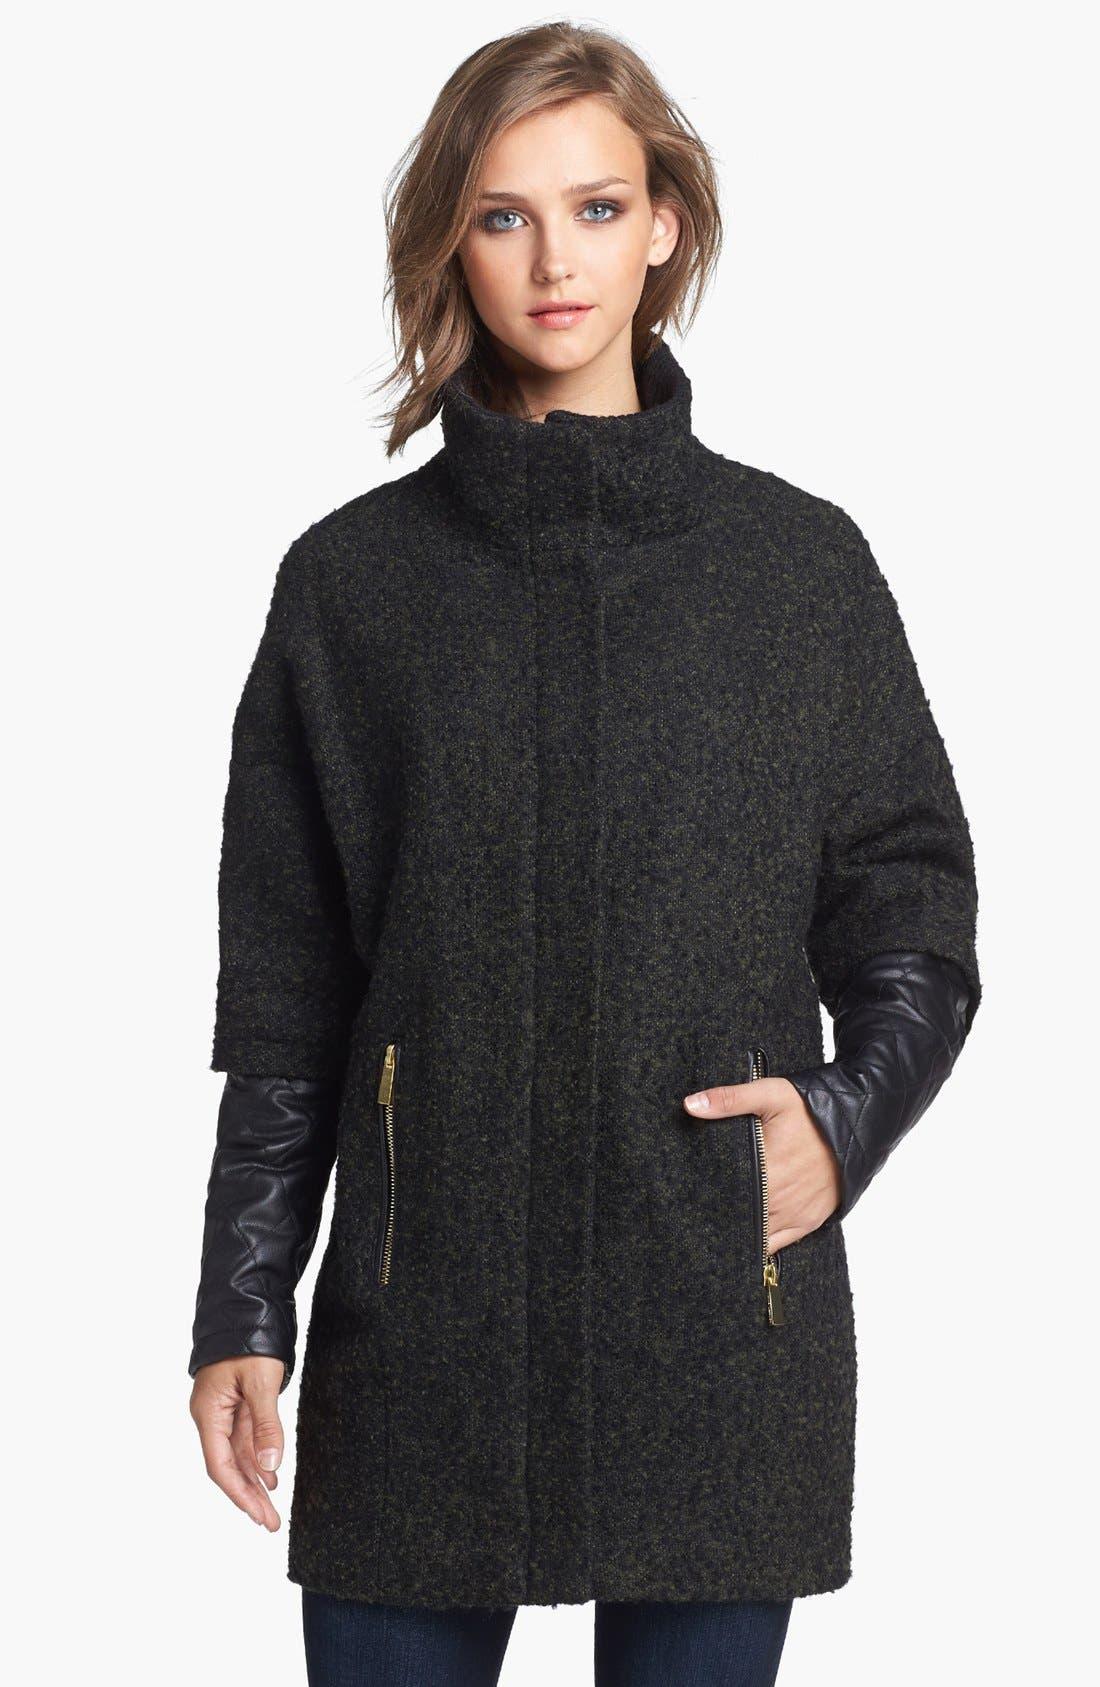 Main Image - Vince Camuto Faux Leather Sleeve Bouclé Tweed Coat